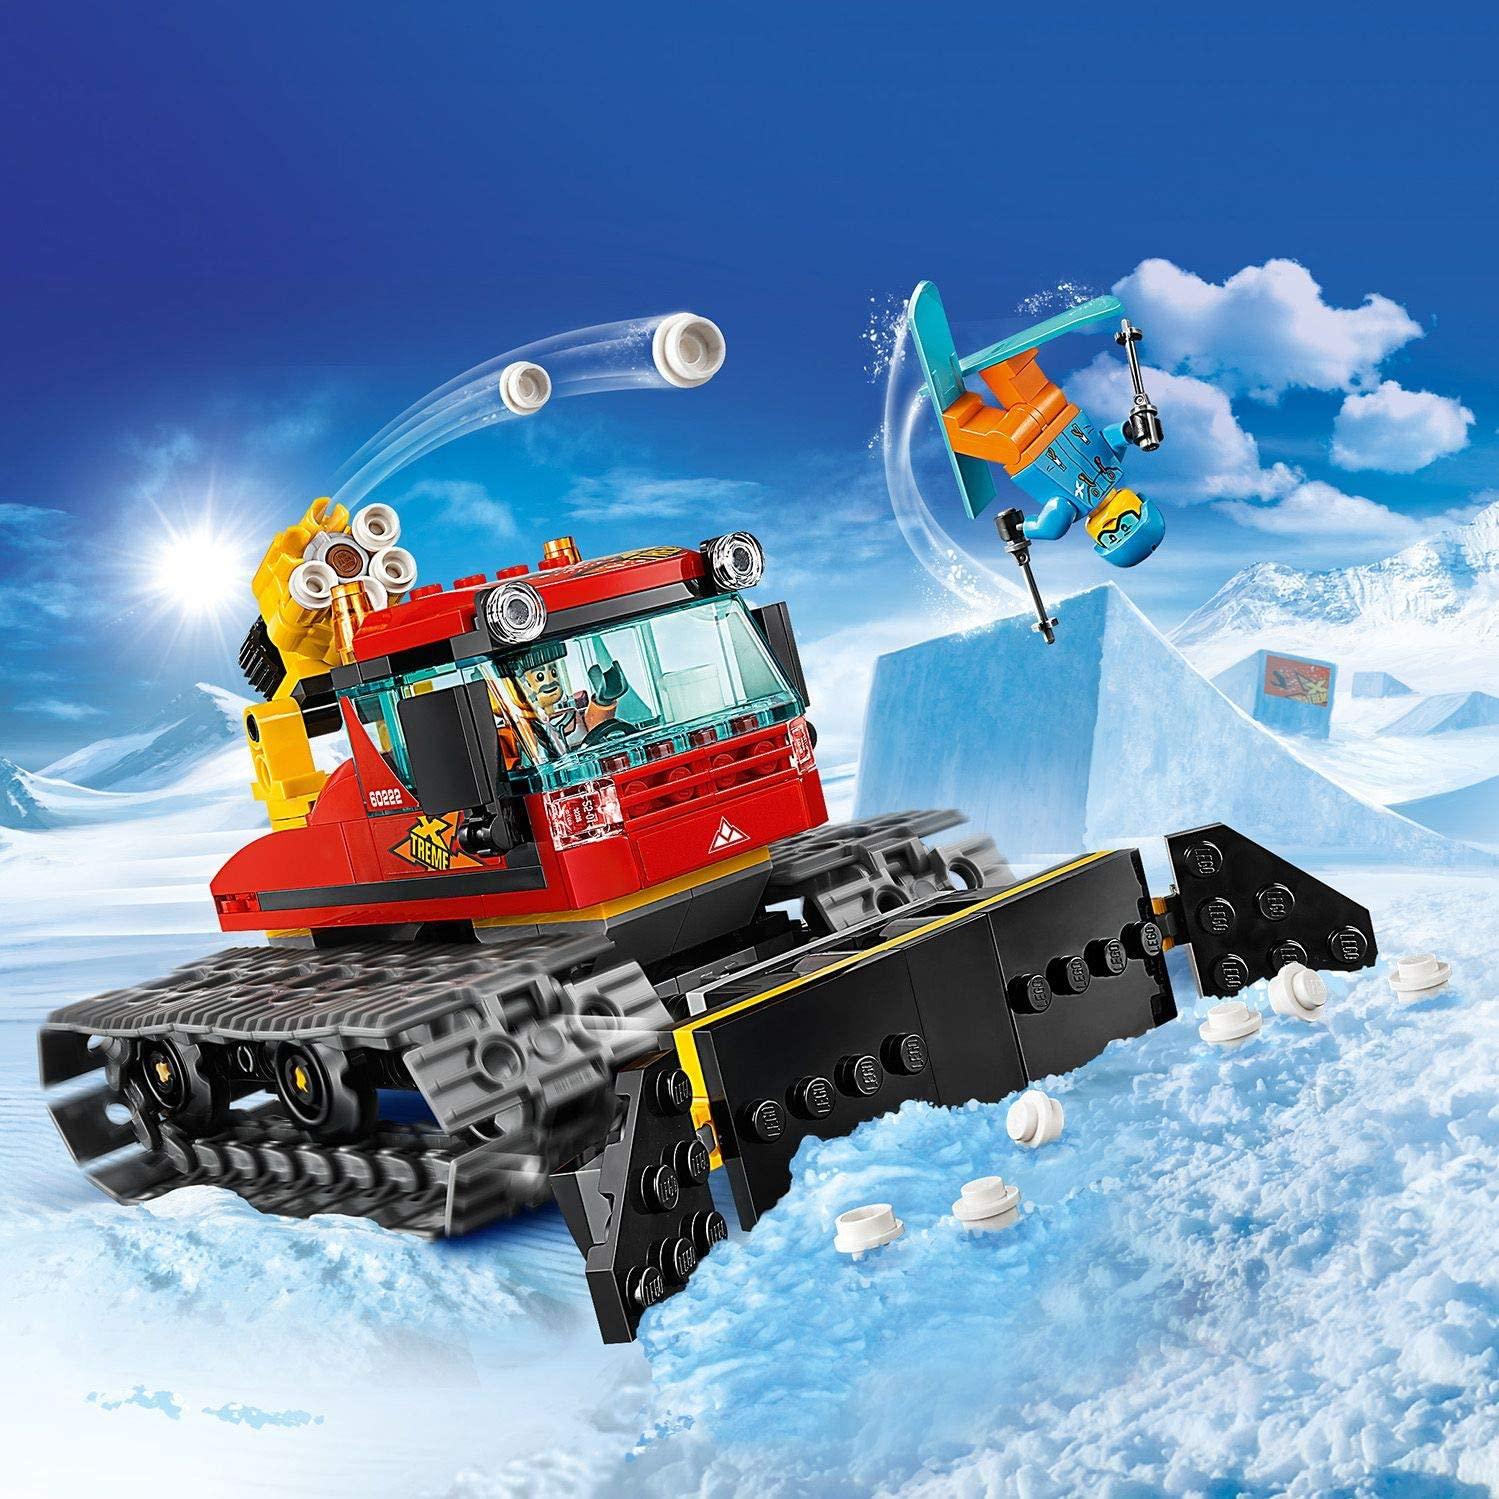 Snow Plower Set